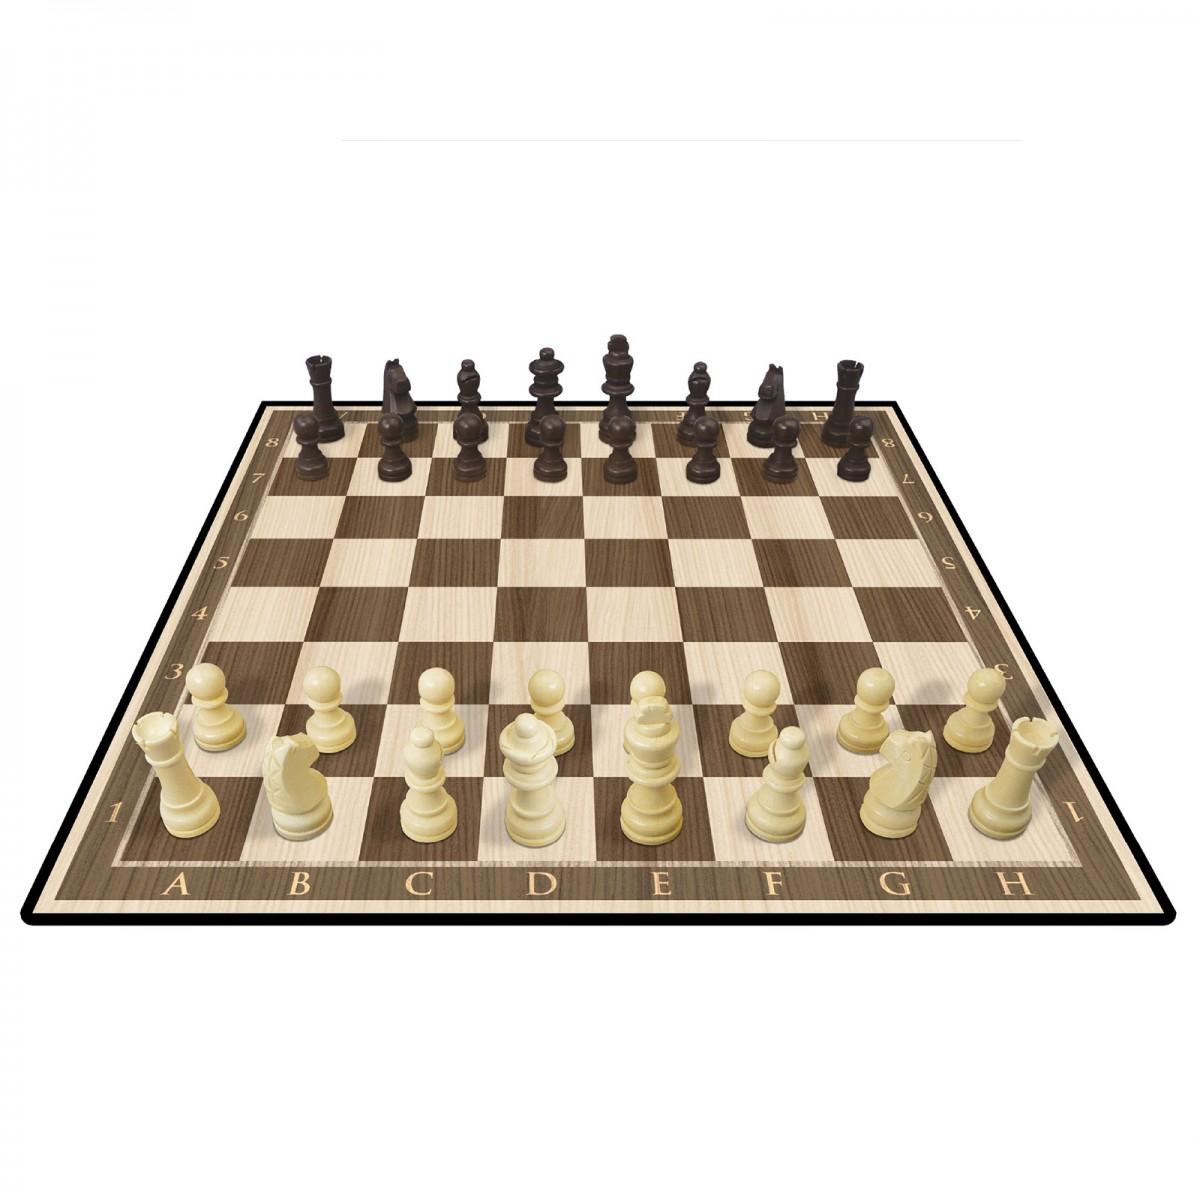 kasparov wood chess set craftsman user manuals sears instruction manuals